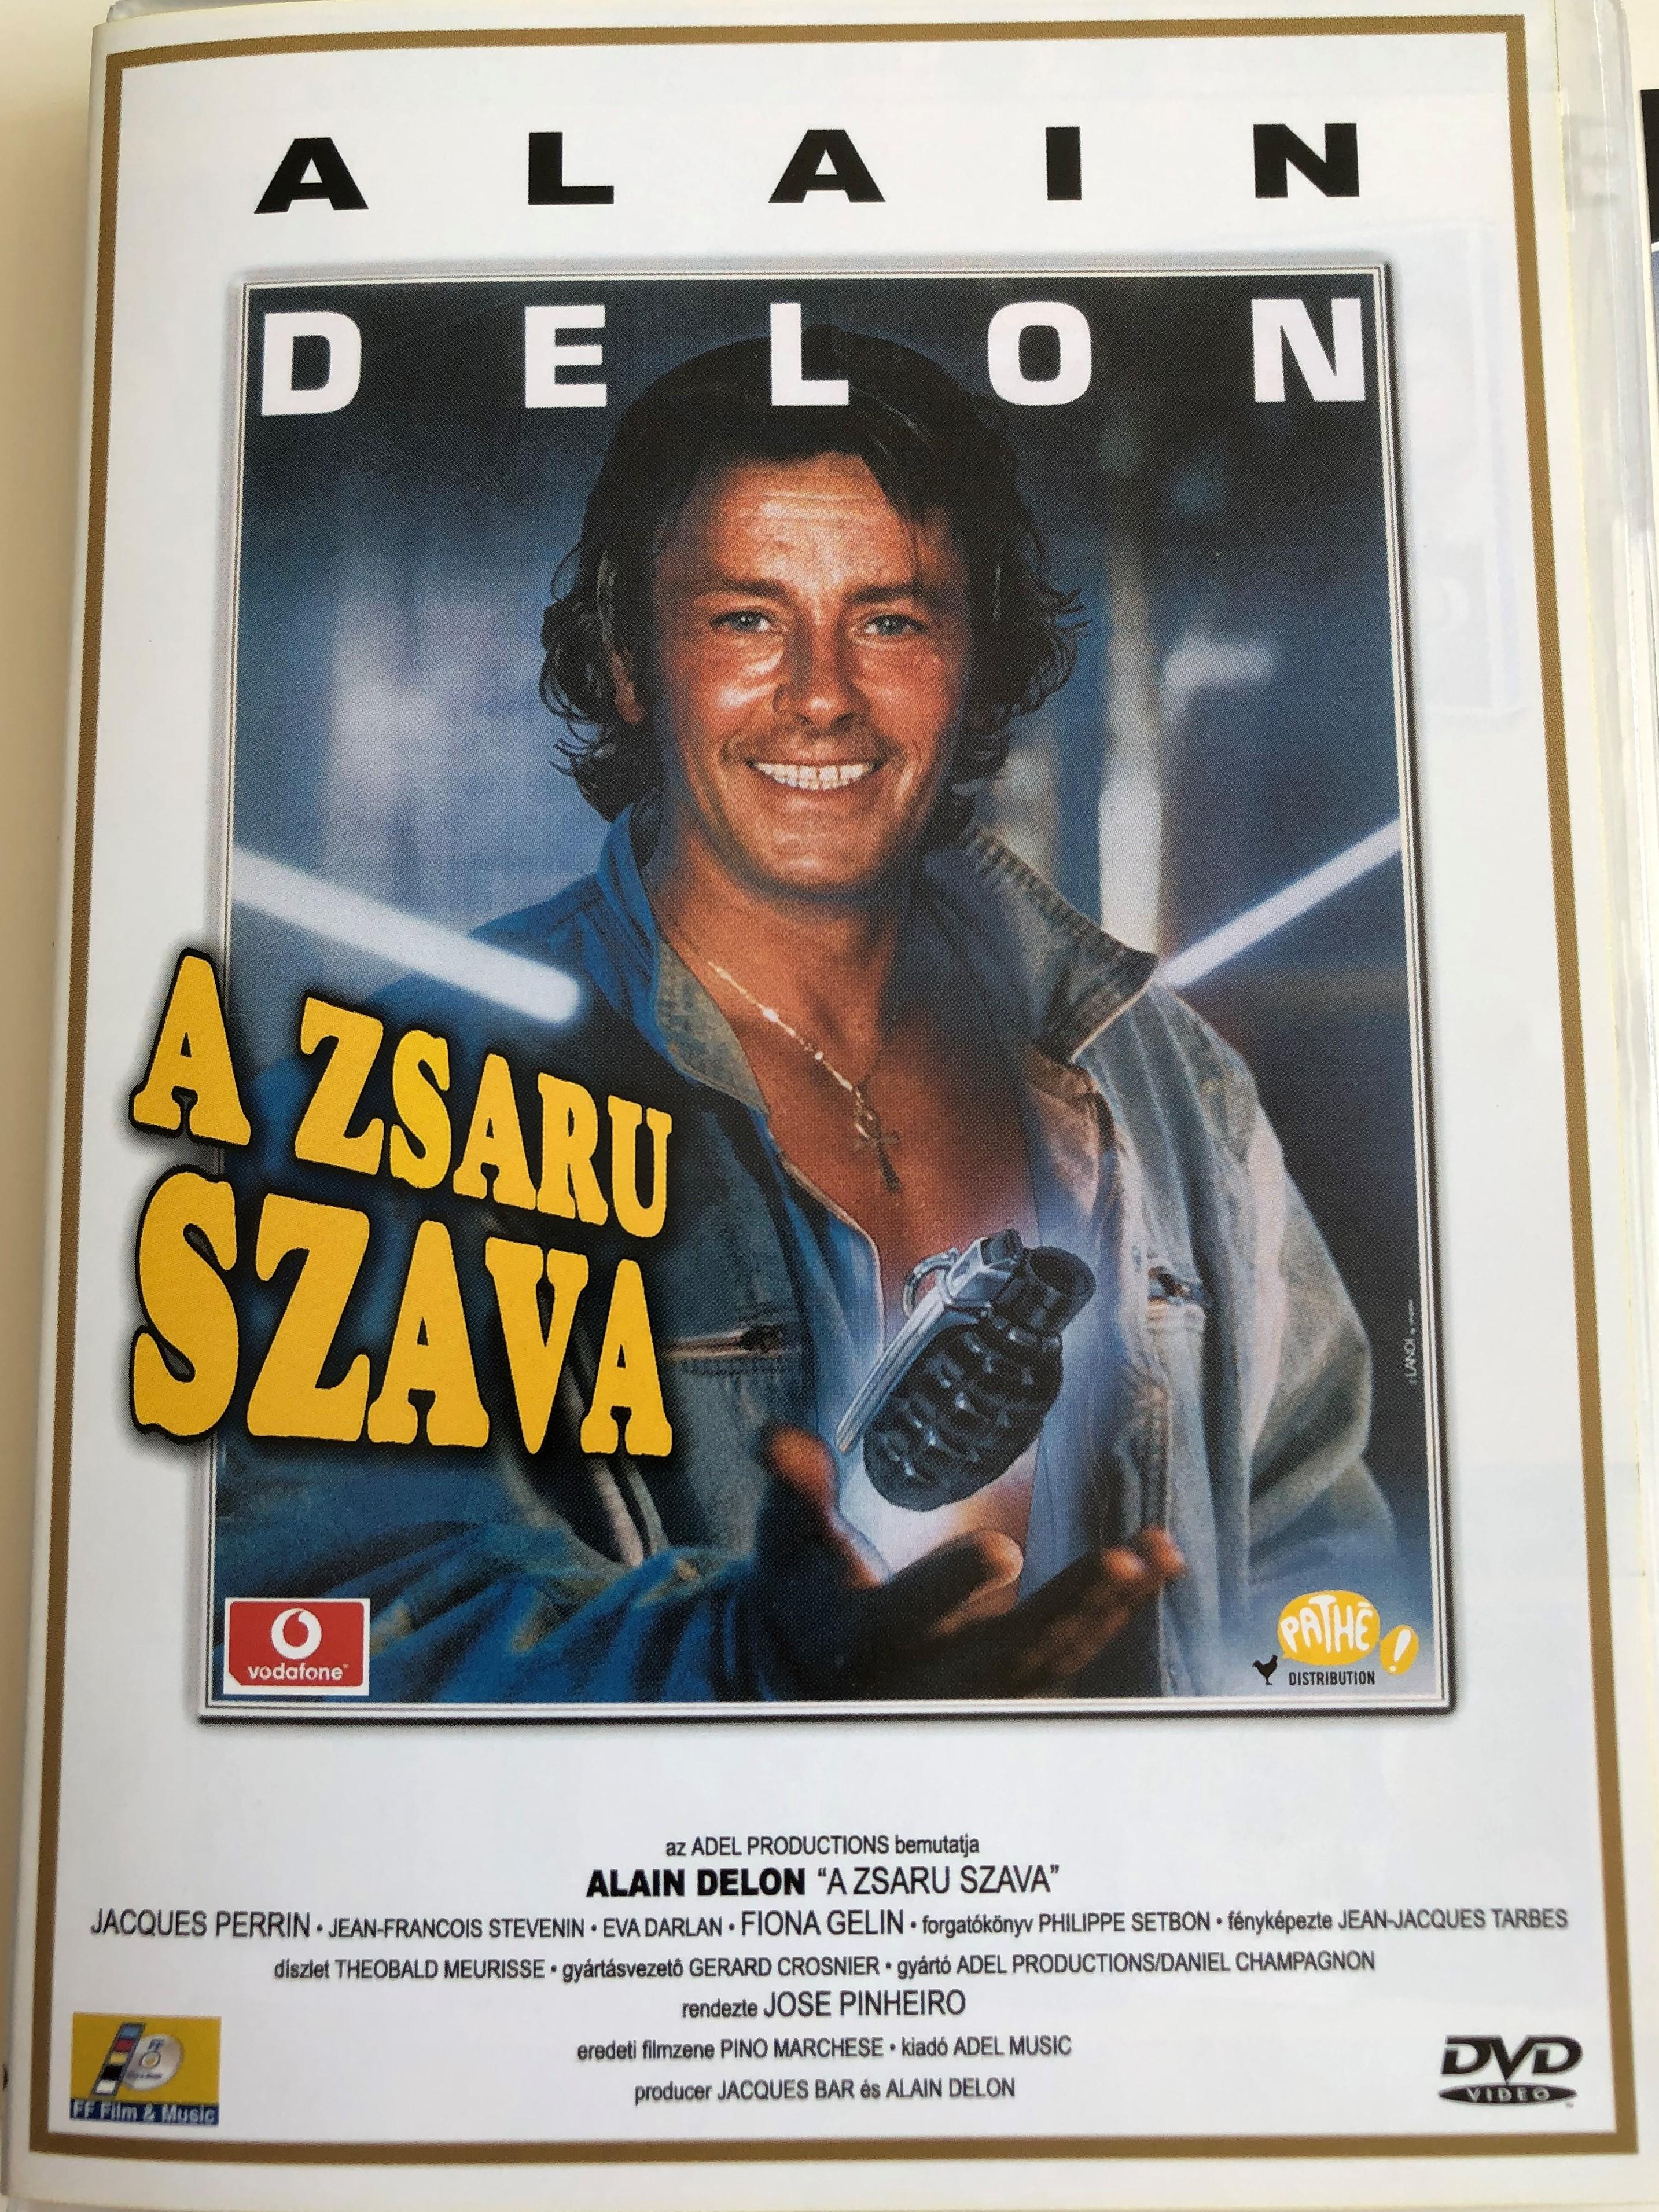 parole-de-flic-dvd-1985-a-zsaru-szava-directed-by-jose-pinheiro-starring-alain-delon-jacques-perrin-arlette-dvd-1997-arlette-szerencs-je-directed-by-claude-zidi-starring-christopher-lambert-josiane-balasko-1-.jpg